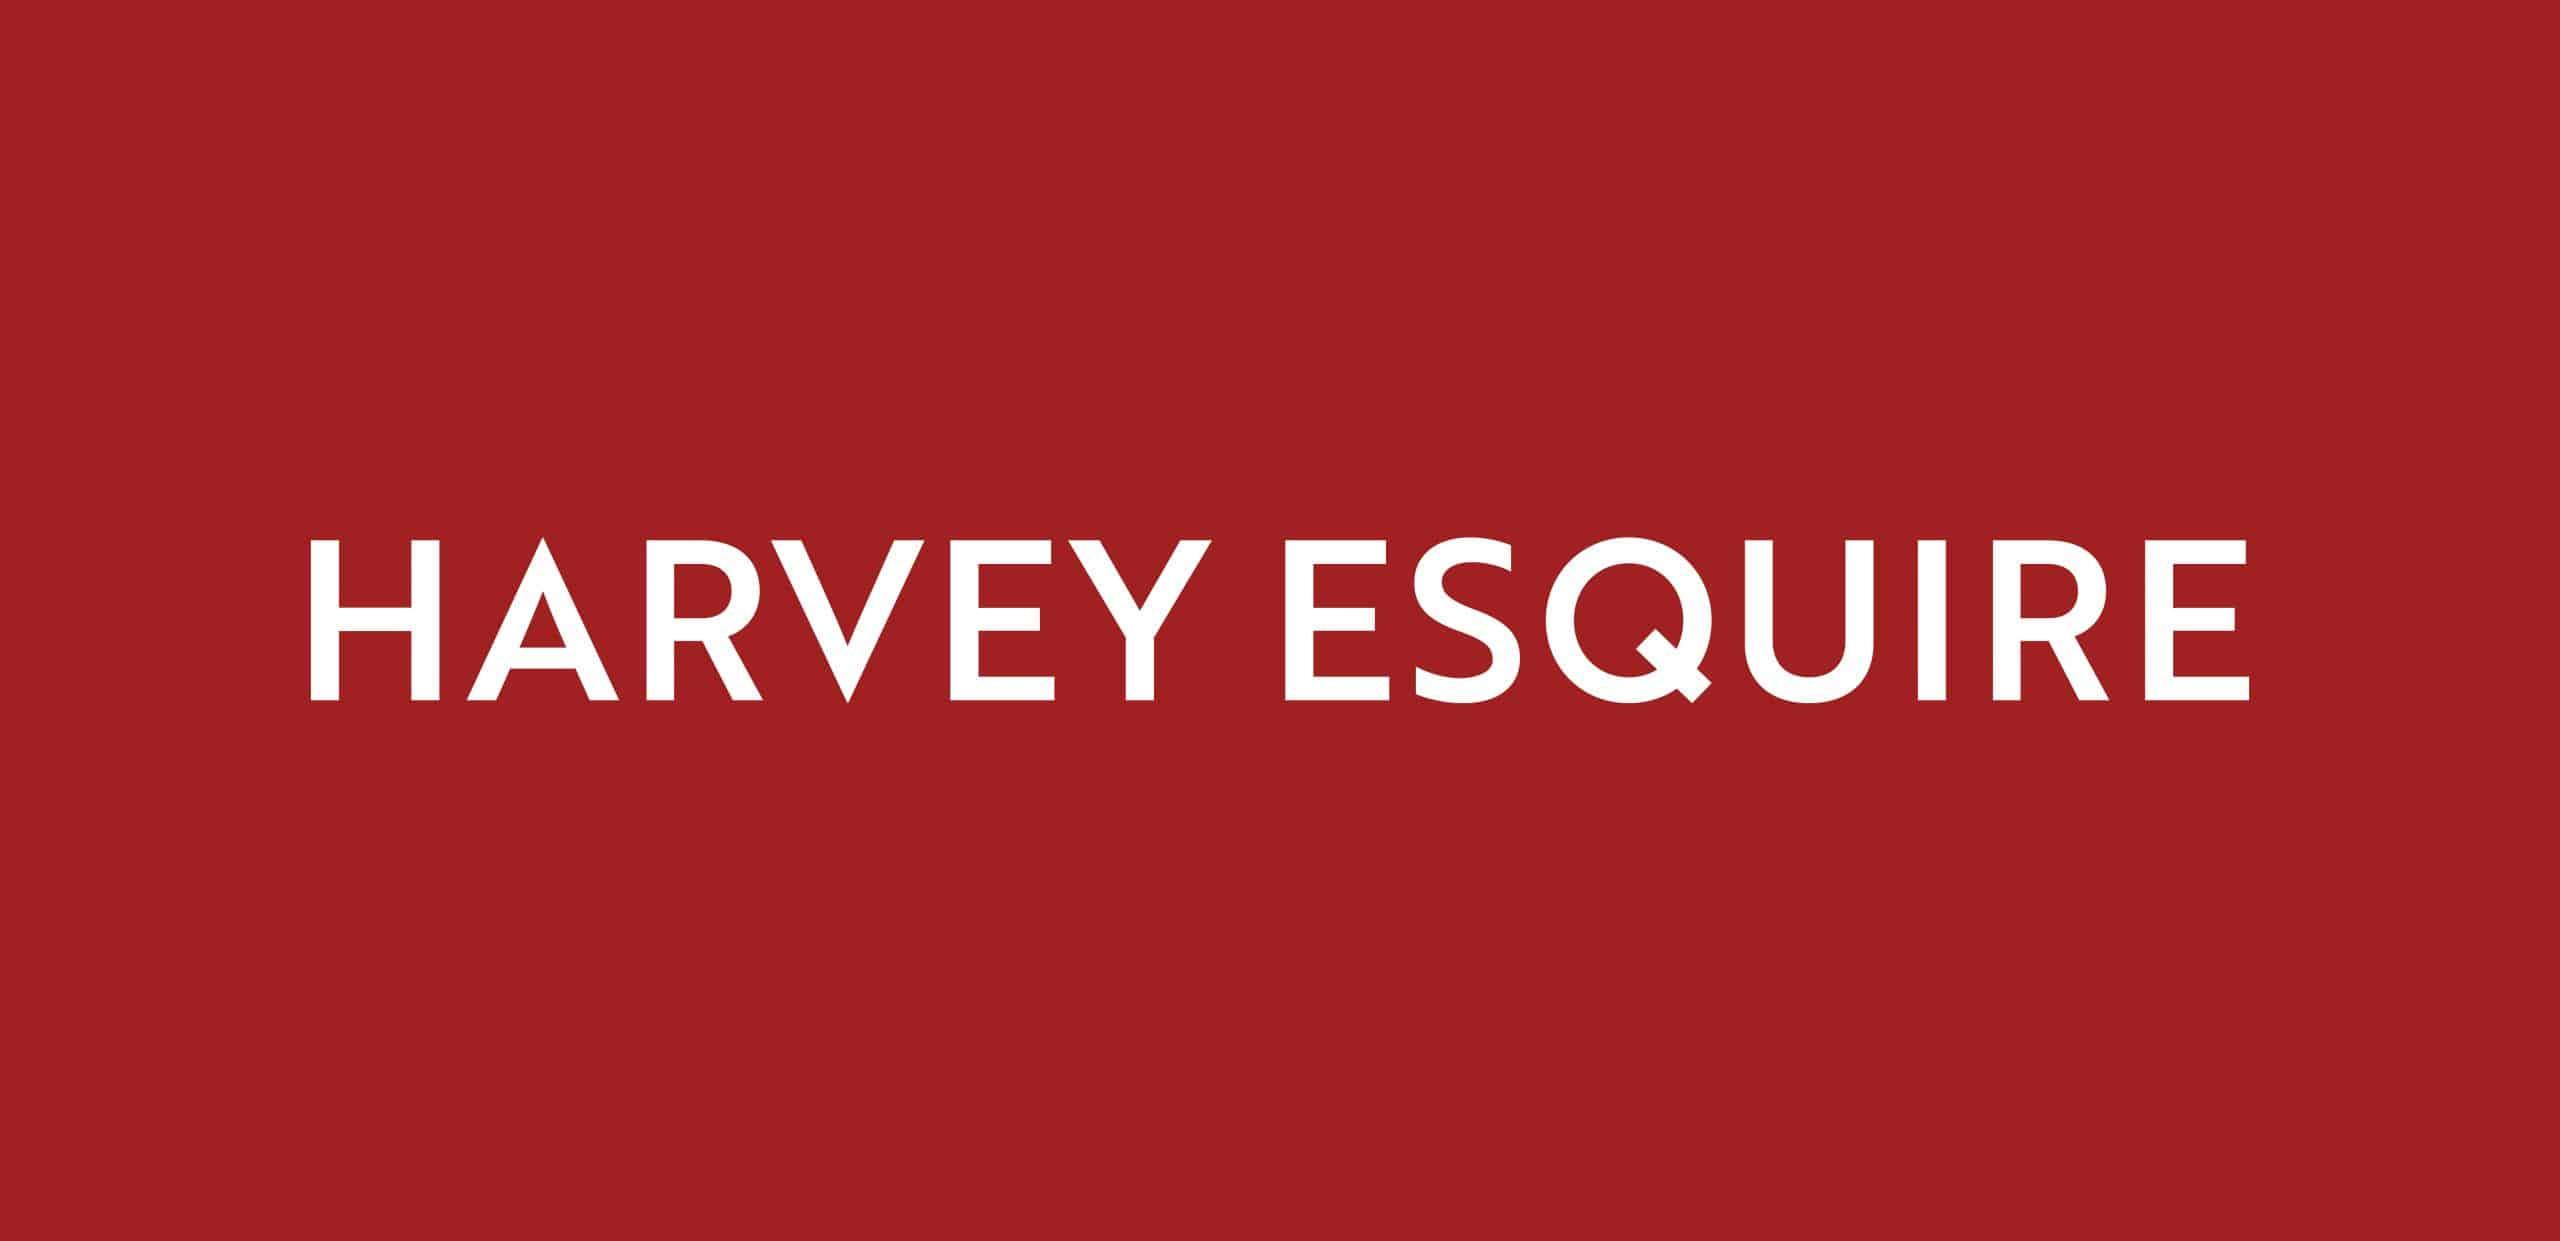 Stellen_Design_Harvey_esquire_Branding-04